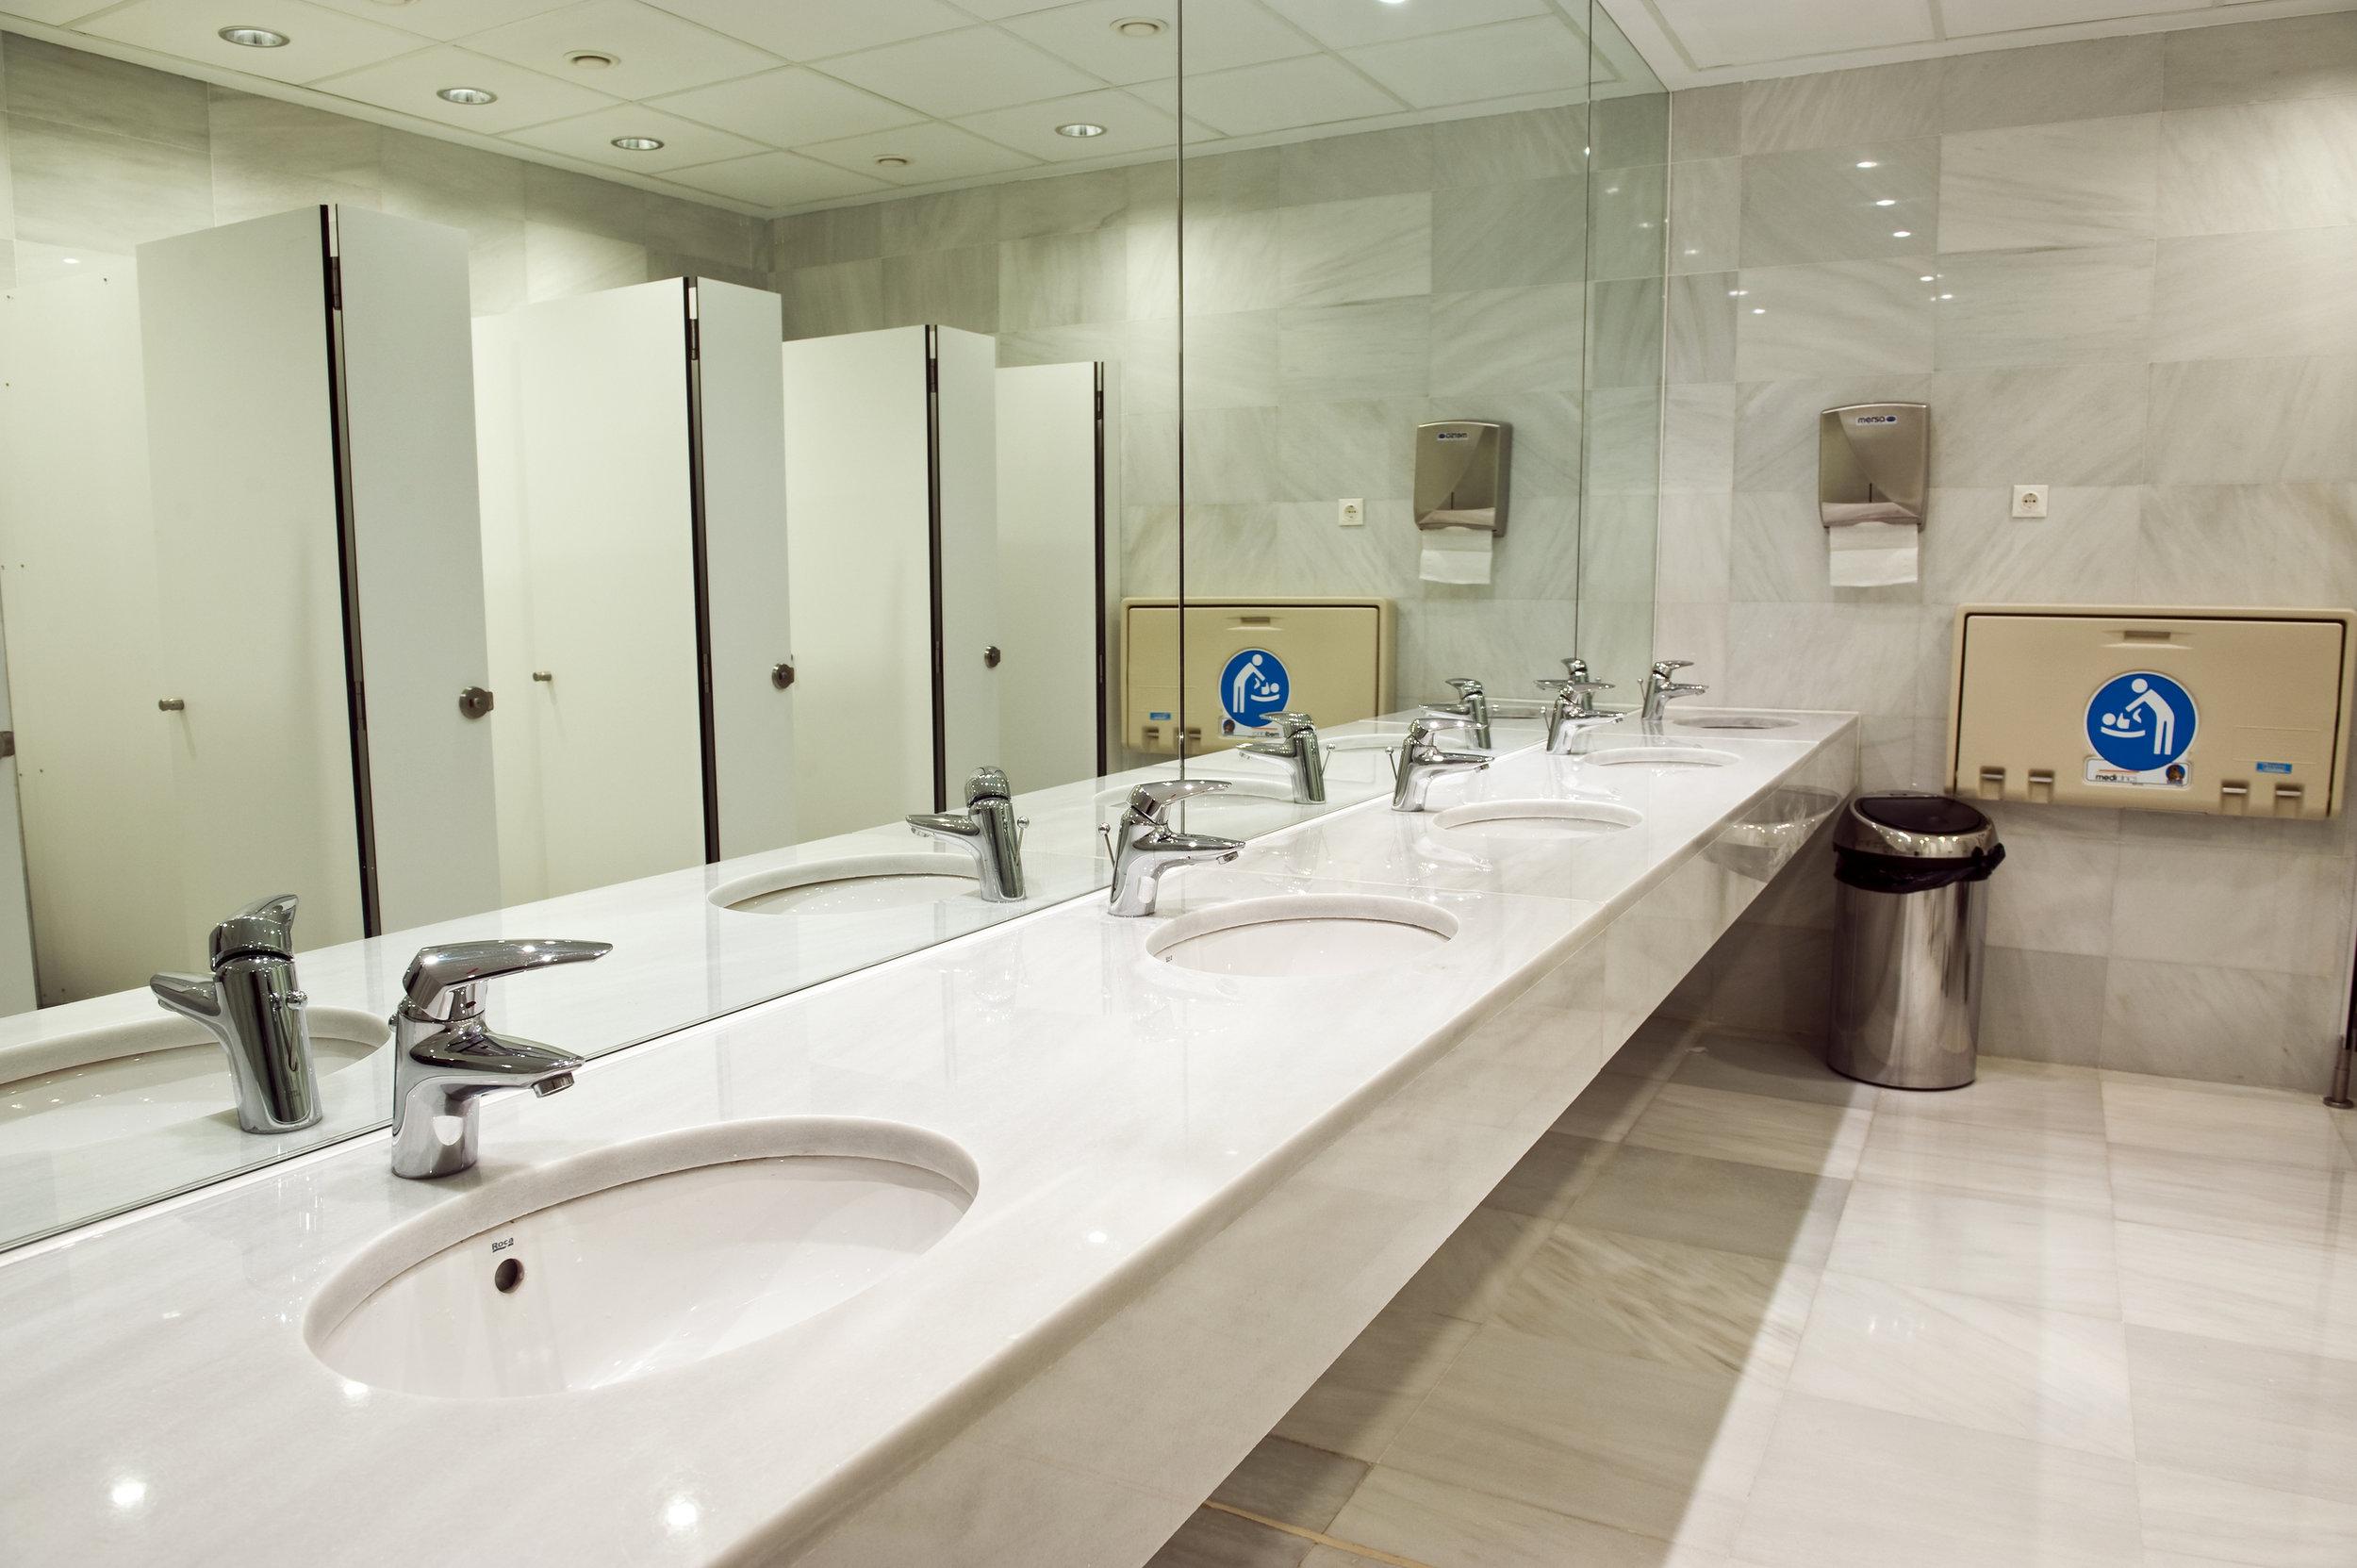 bigstock-Public-empty-restroom-with-was-28362929.jpg